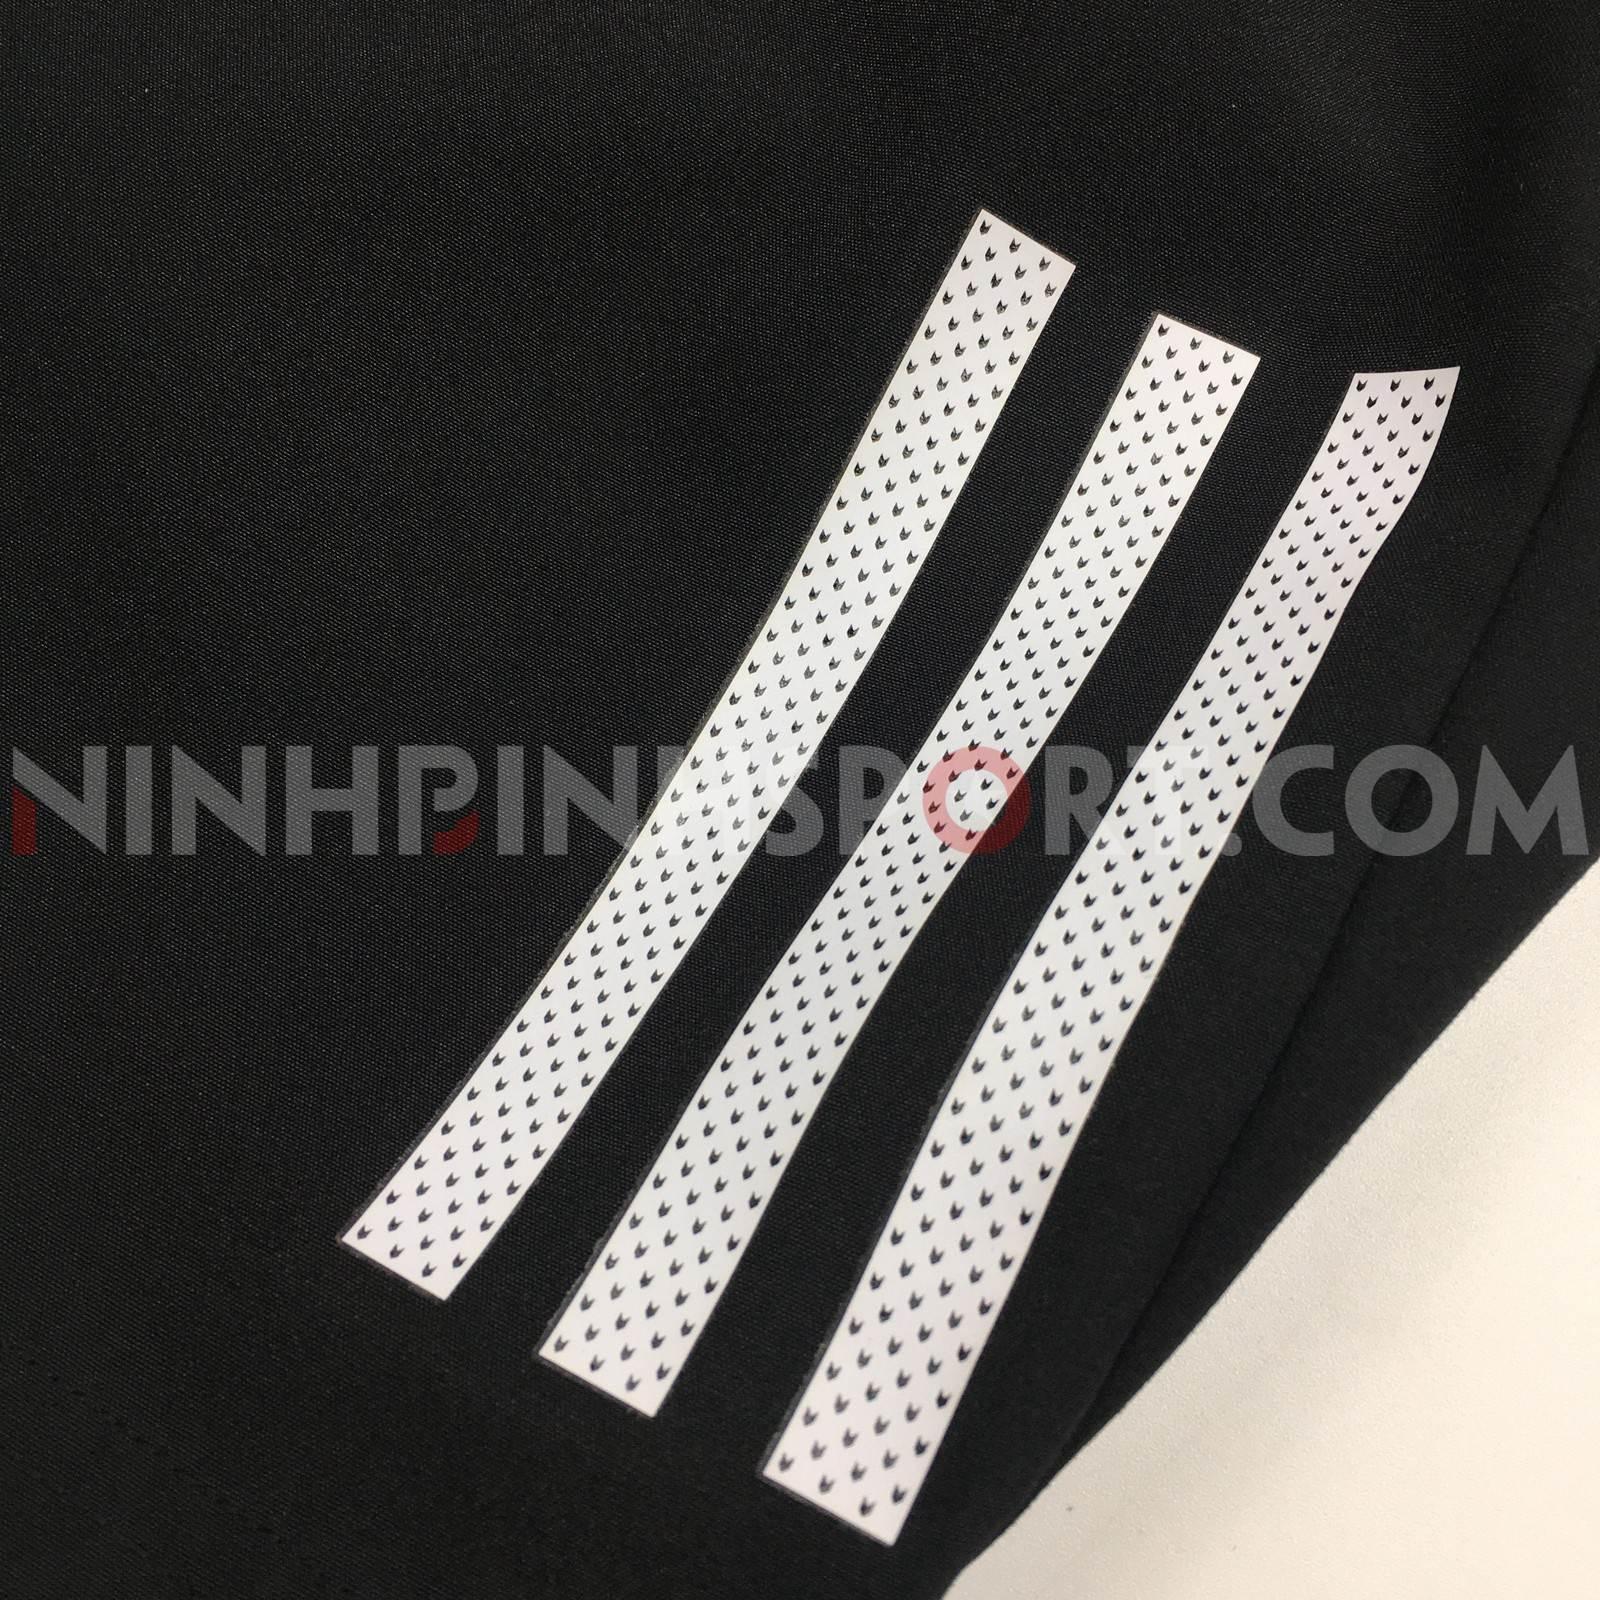 Quần thể thao nam Adidas Club 3-Stripes 9-Inch DU0874